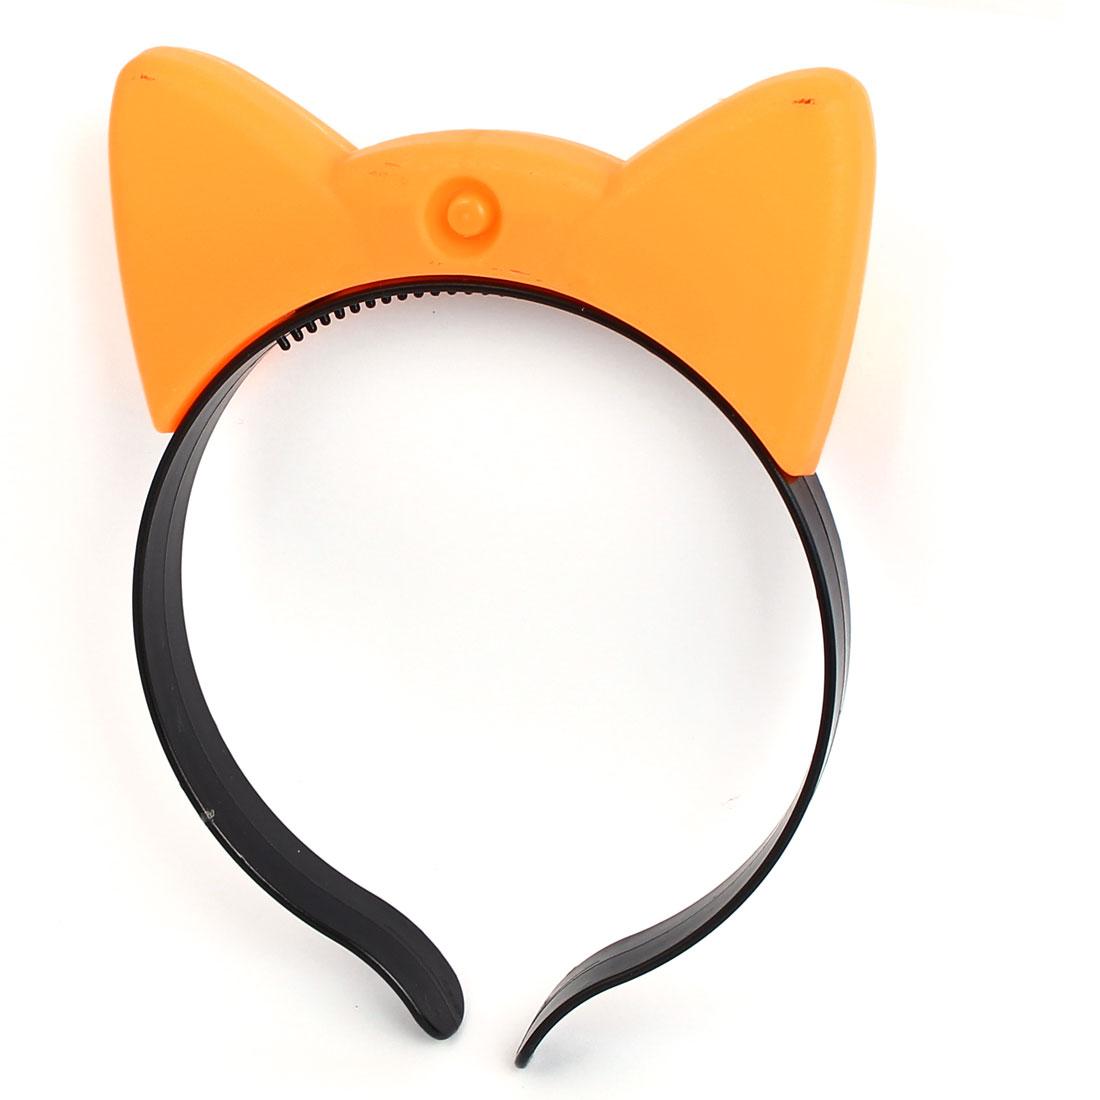 Cosplay Flash  Cat Ear Light Blinking Hair Band Hairband Headband Orange - image 1 de 3